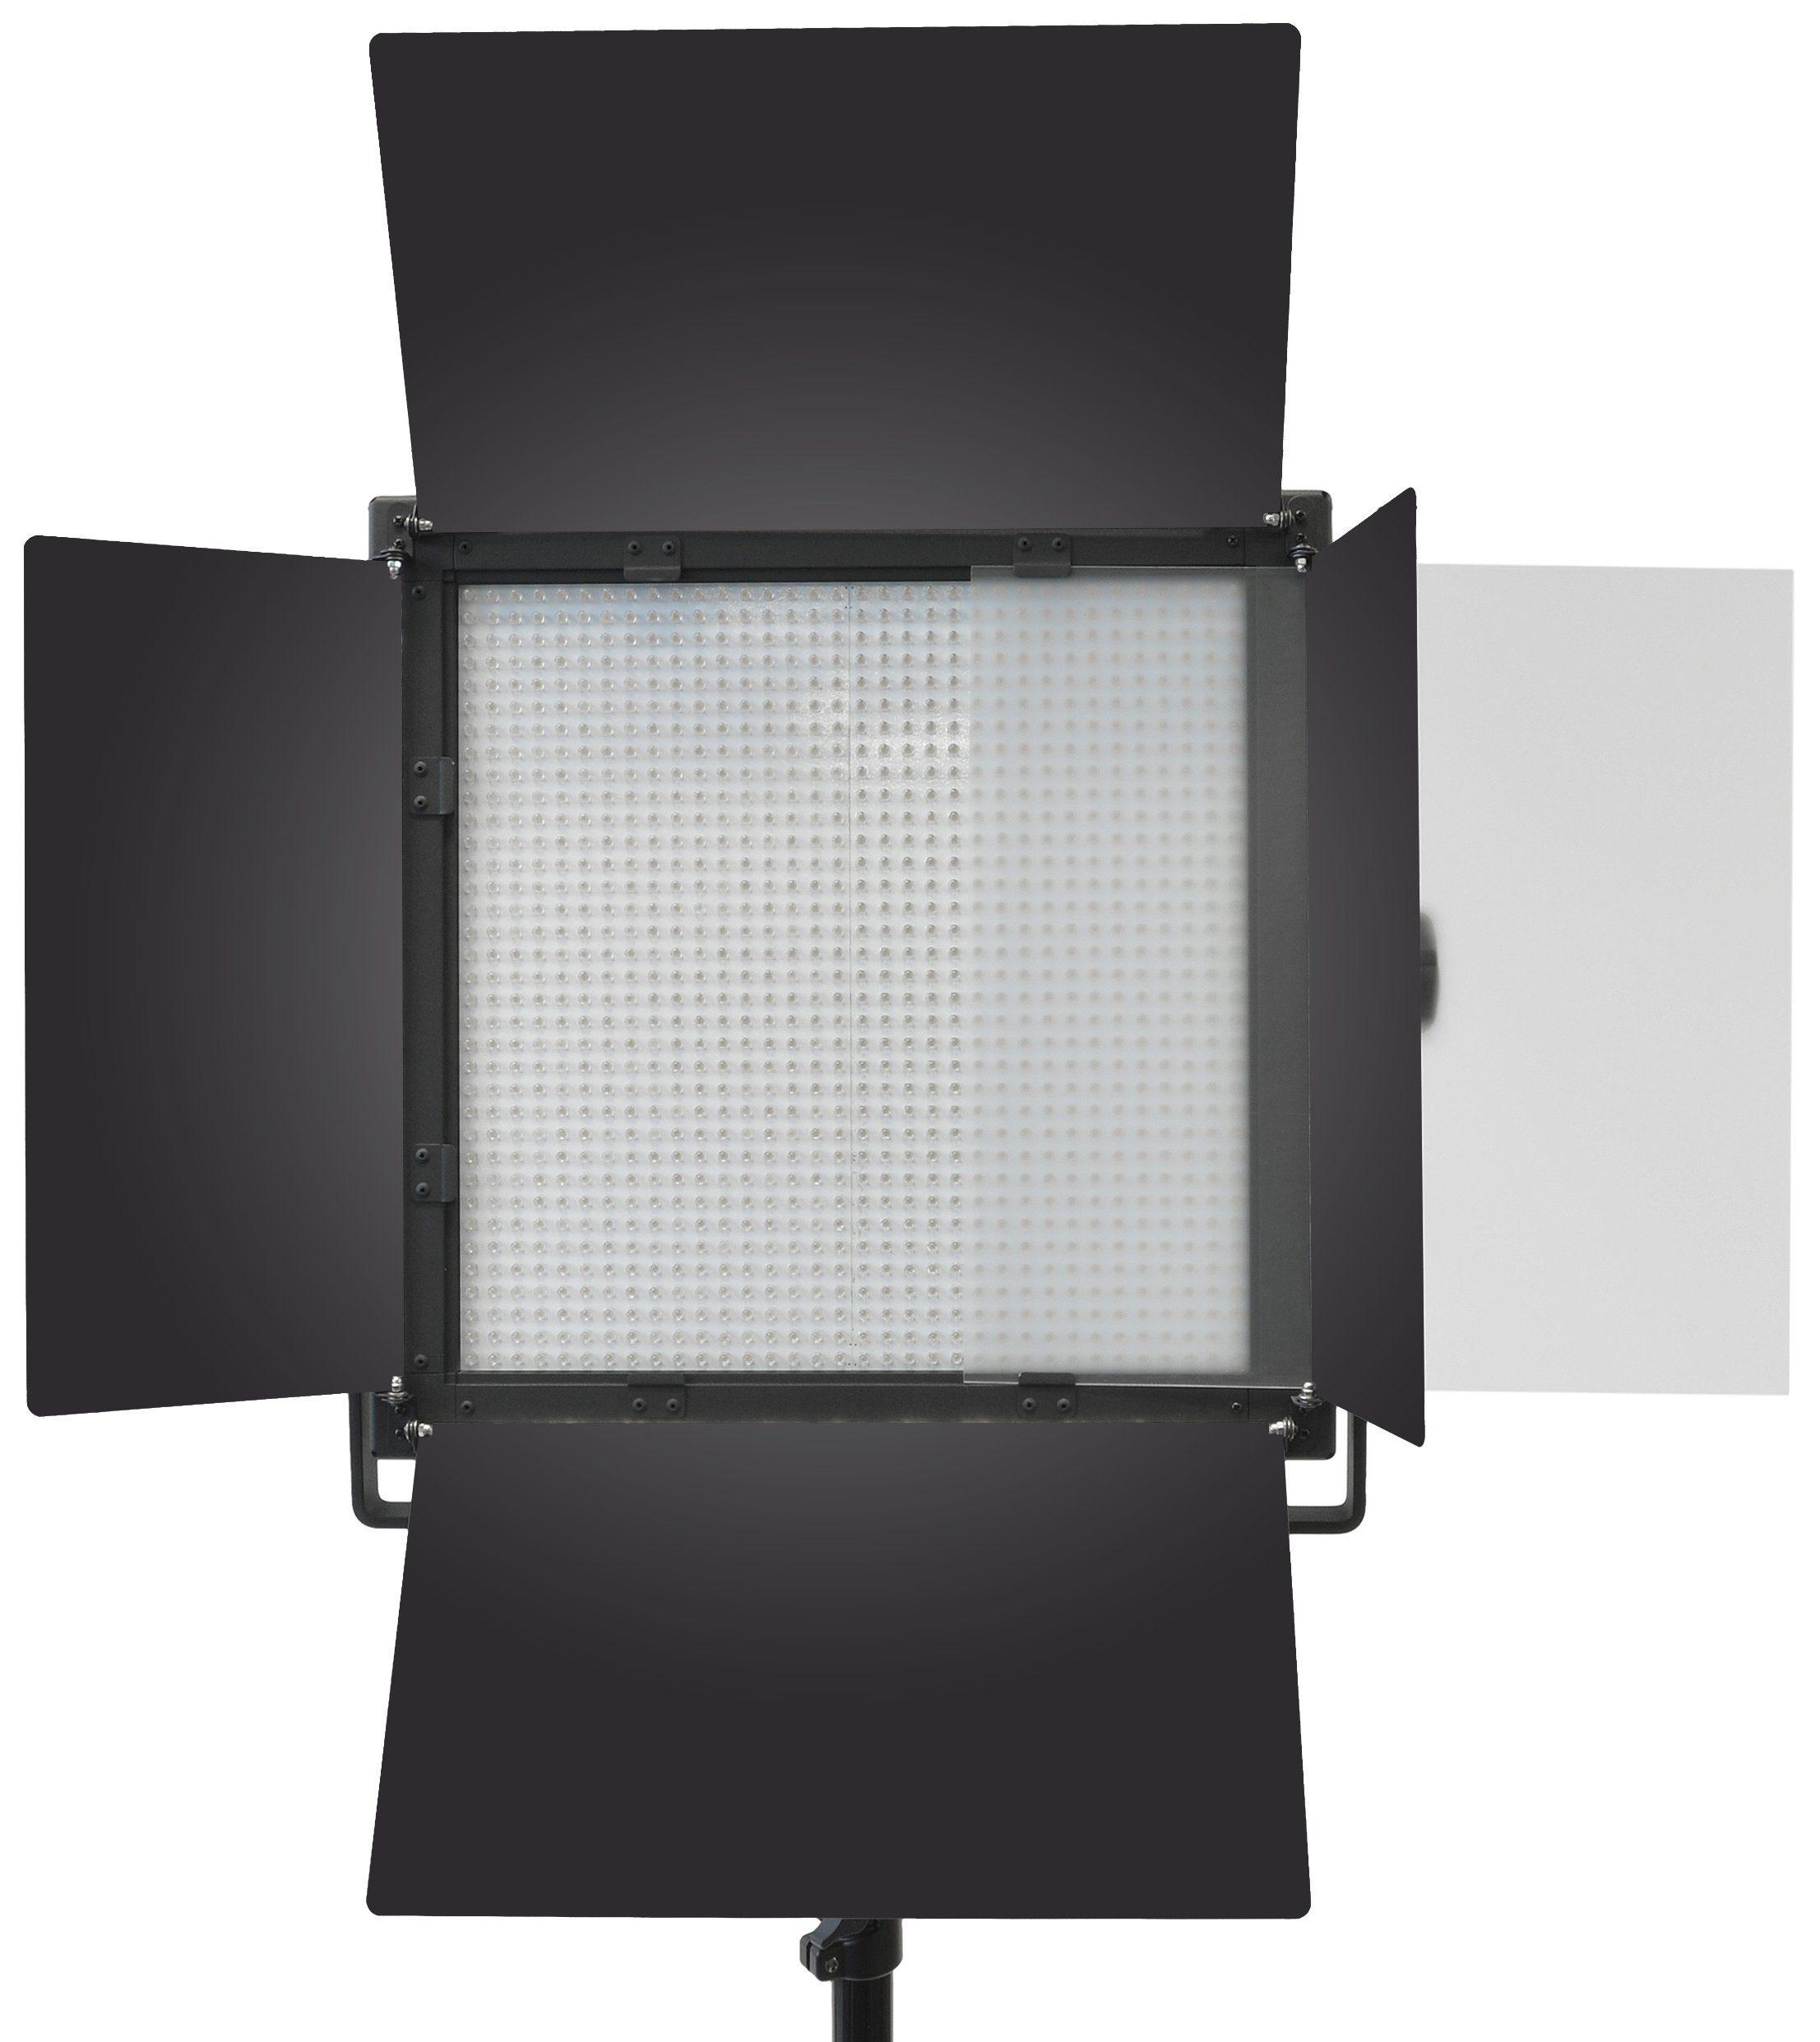 Bresser Fotostudio »LS-900 LED Studiolampe 54W/8.860LUX«